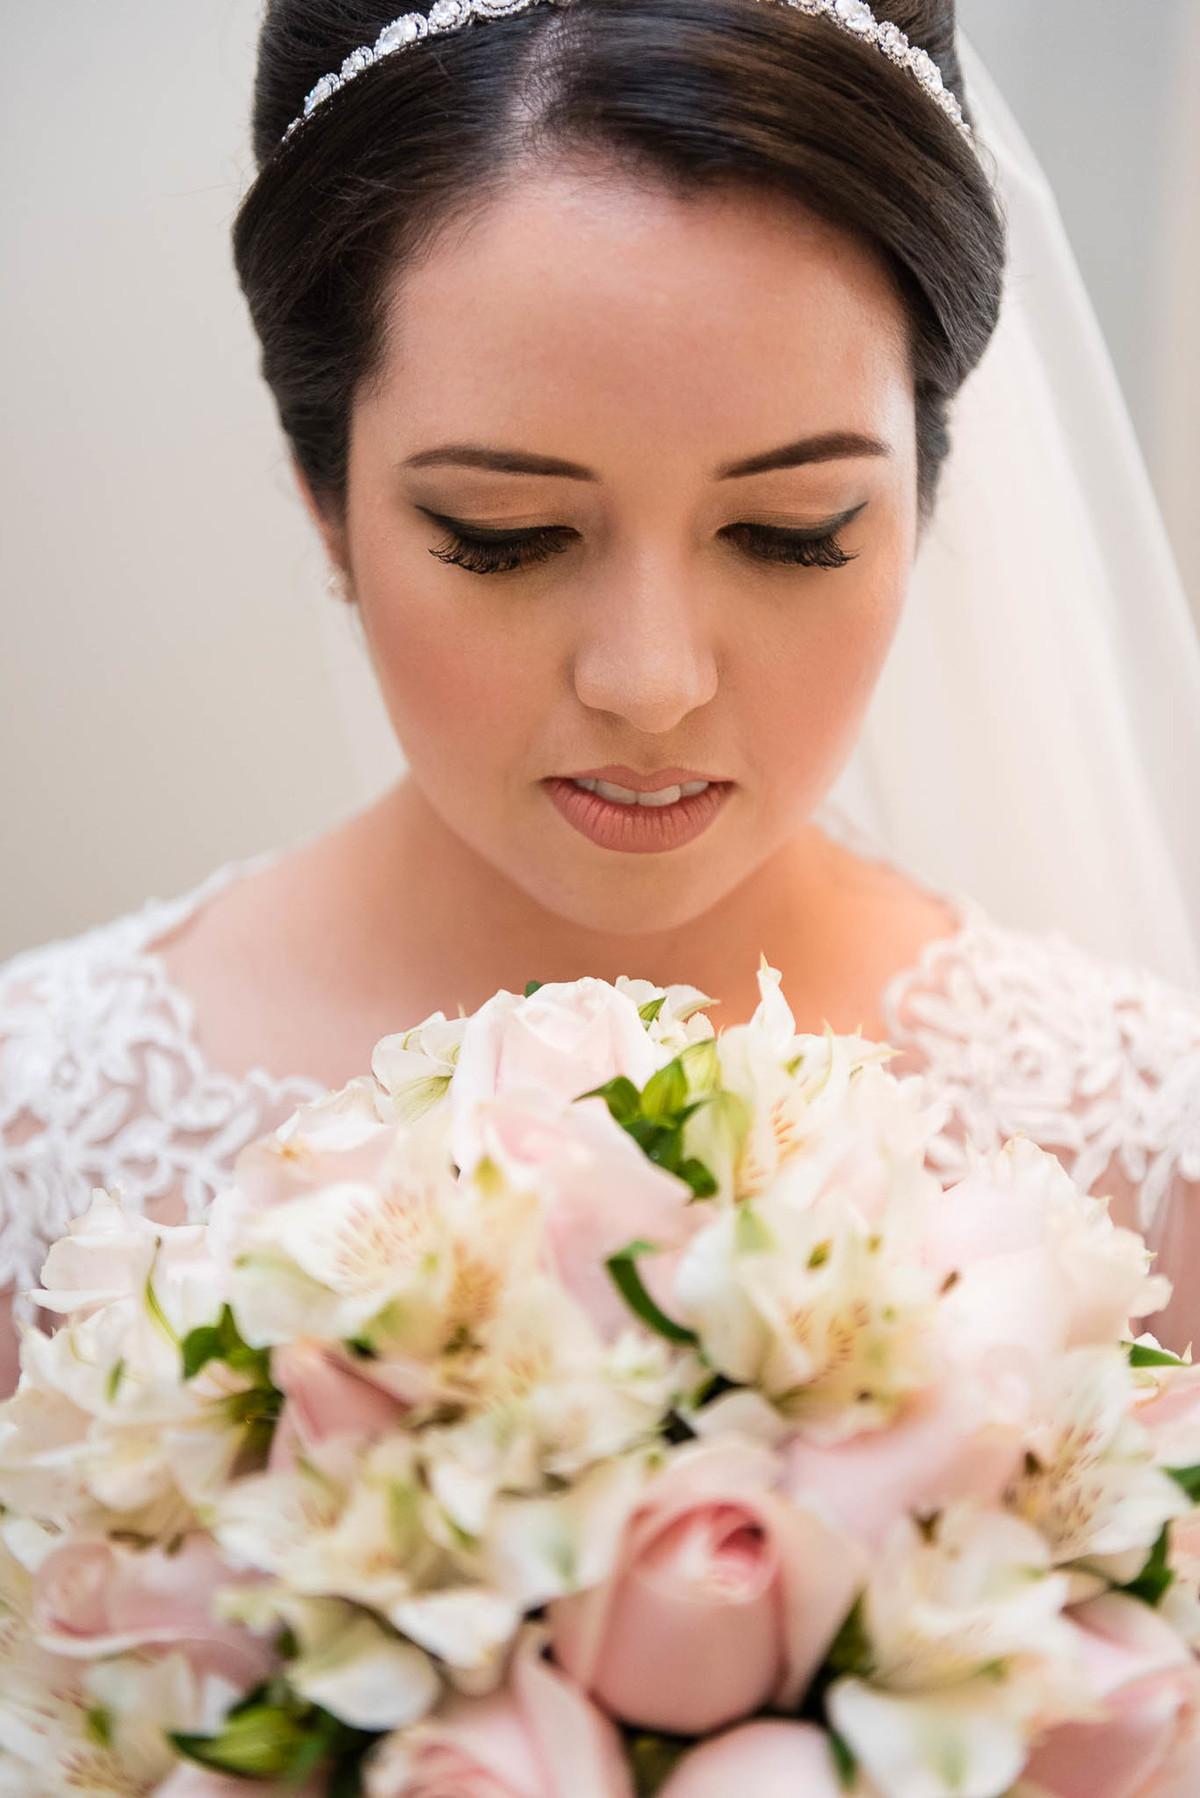 fotografia noiva bouquet make-up olhar fotografia retrato véu wewfotografia